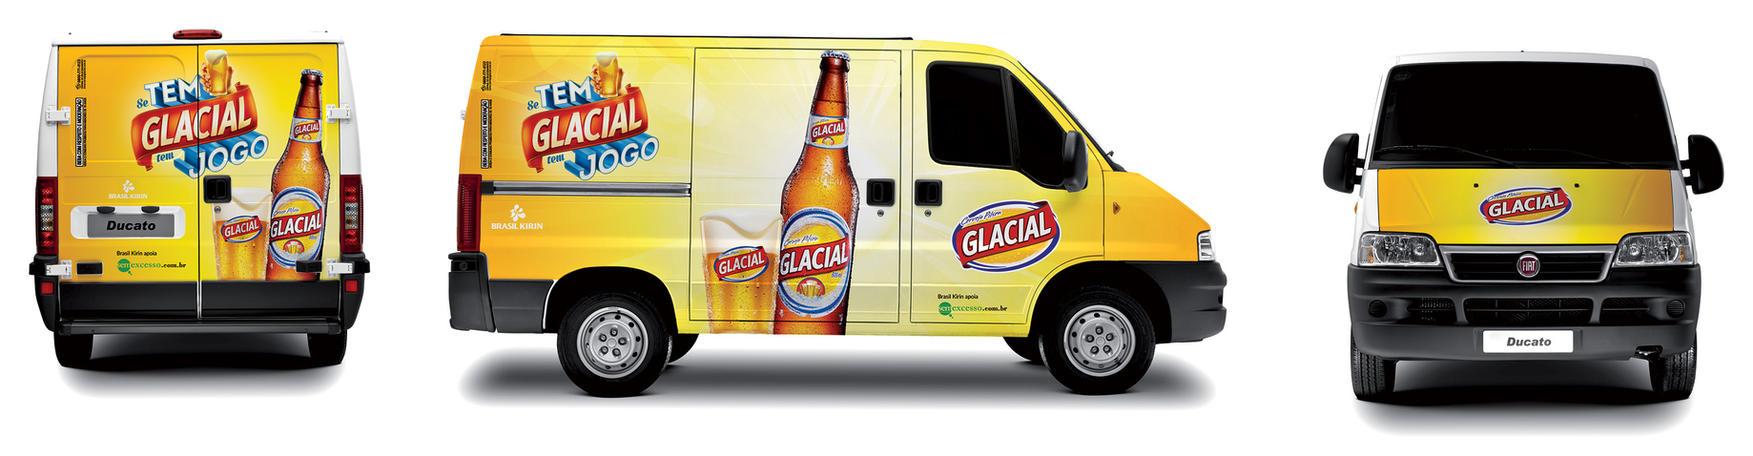 Glacial Beer Van by LGRuffa